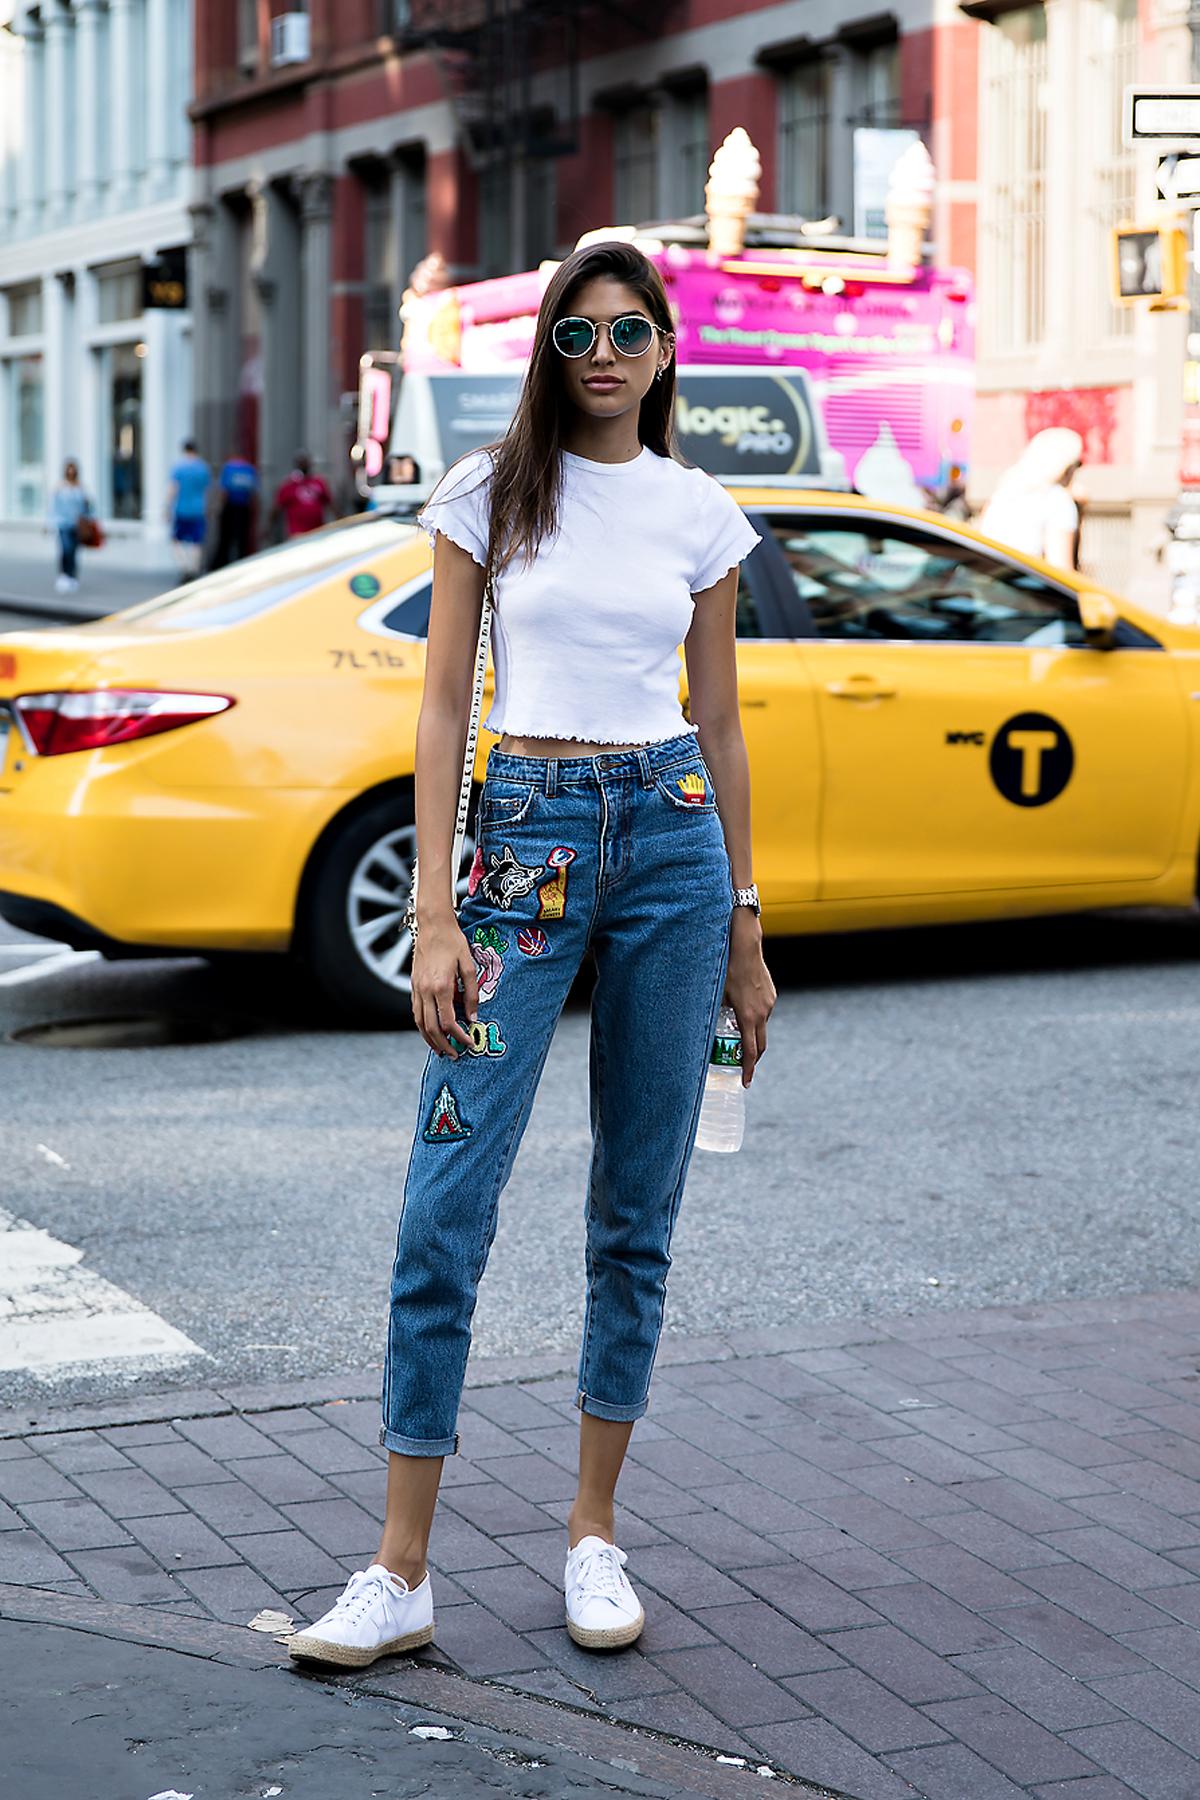 Laraghraoui larakusez, Street Fashion 2017 in New York.jpg